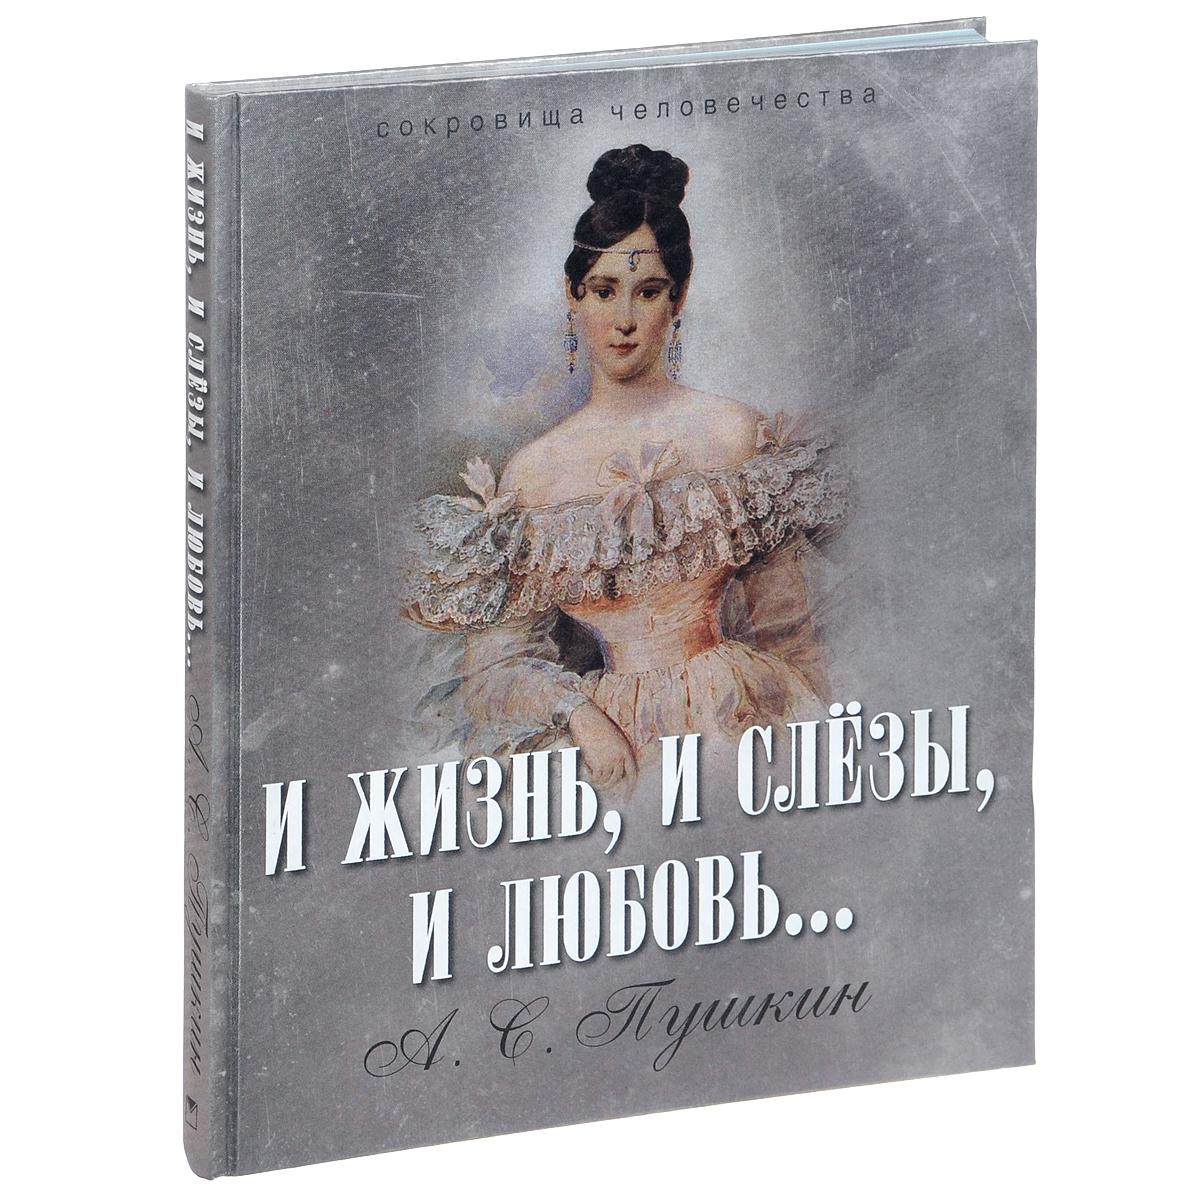 А. С. Пушкин И жизнь, и слезы, и любовь... пушкин а с и жизнь и слезы и любовь isbn 978 5 373 07150 5 в подарочном футляре